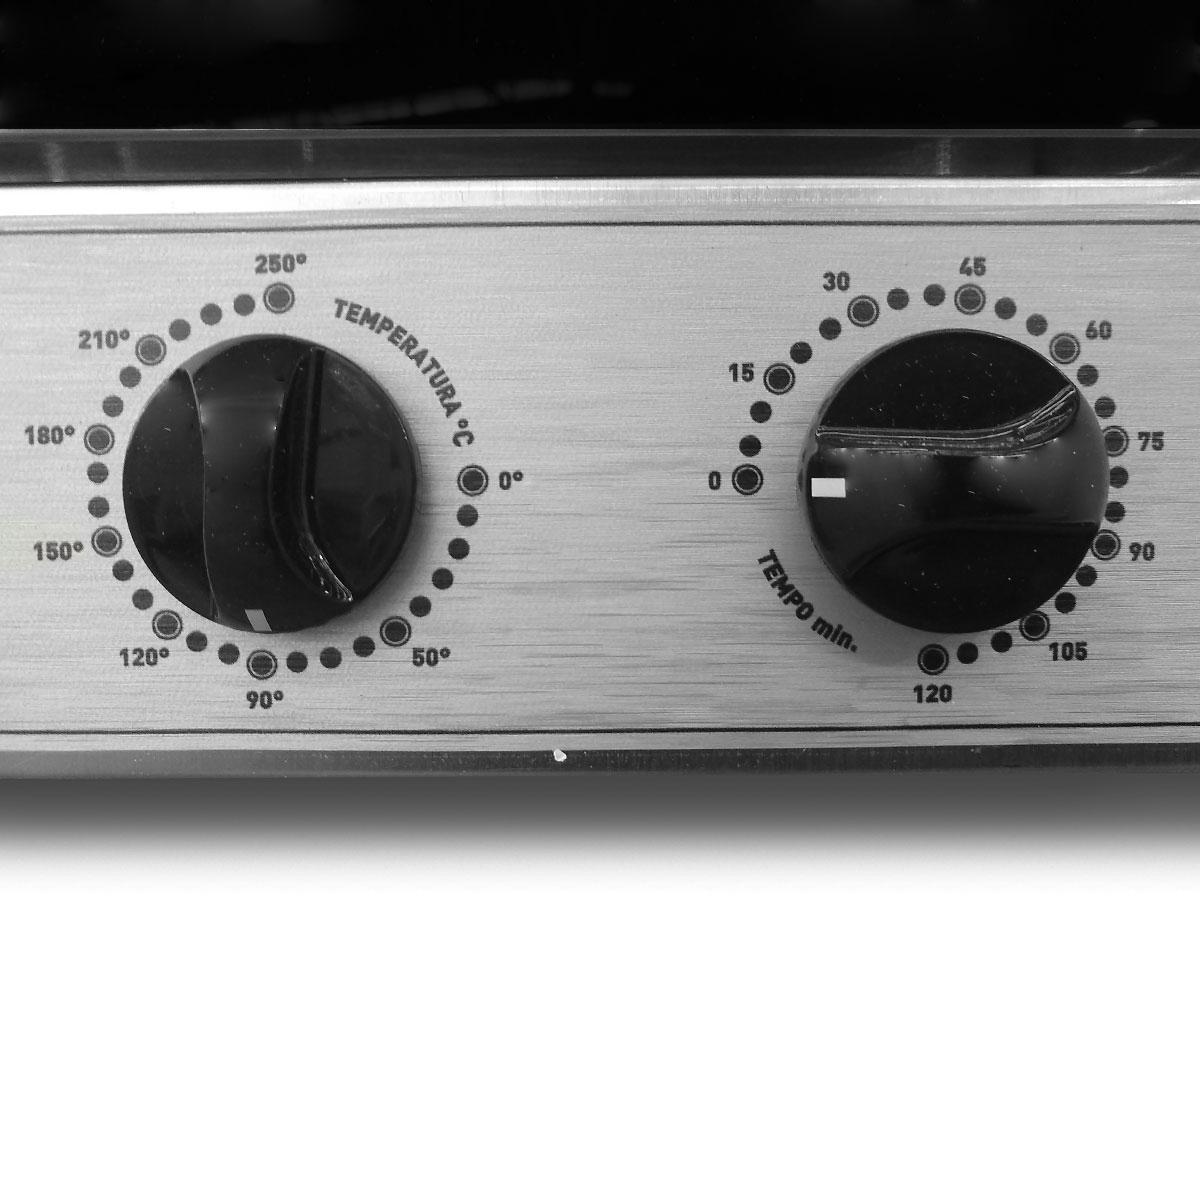 Forno Turbo Elétrico Prp-004 G2 Assador de Alimentos Fast Oven - Progás  - Carmel Equipamentos